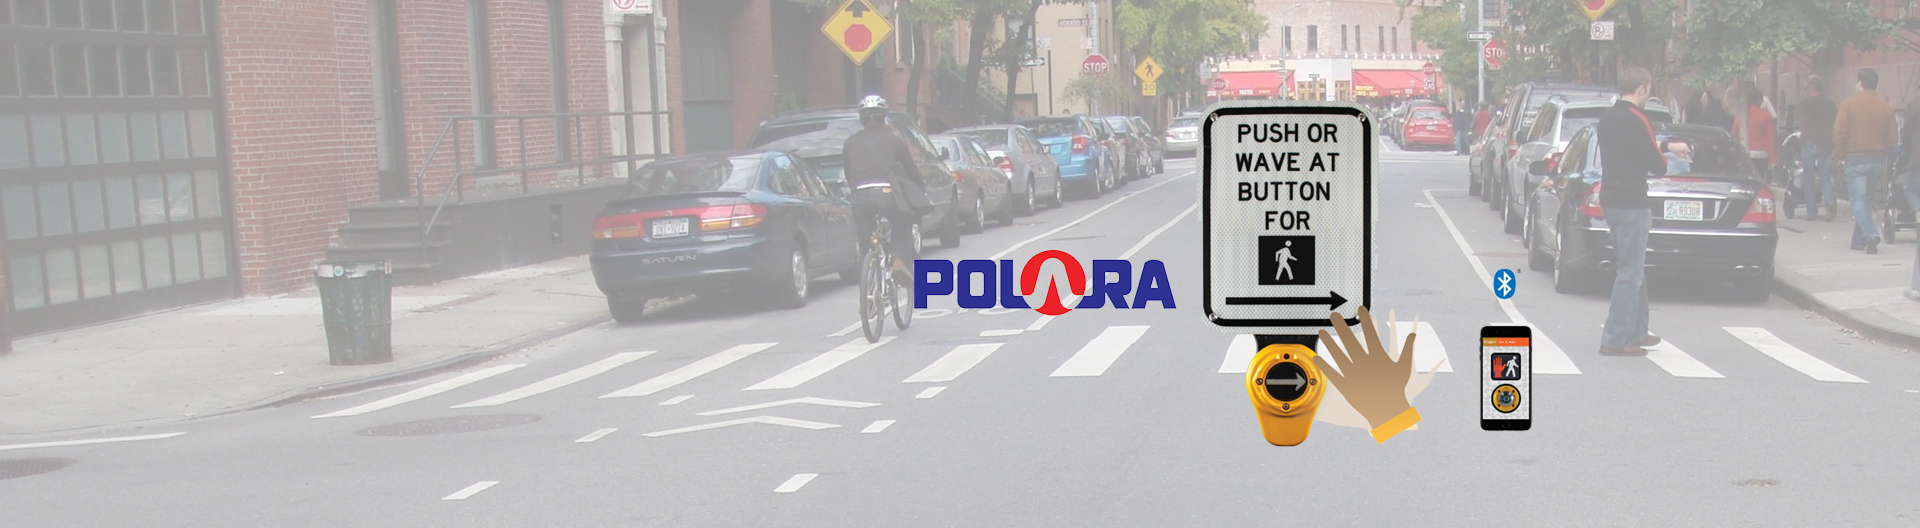 Polara traffic control iDetect Banner